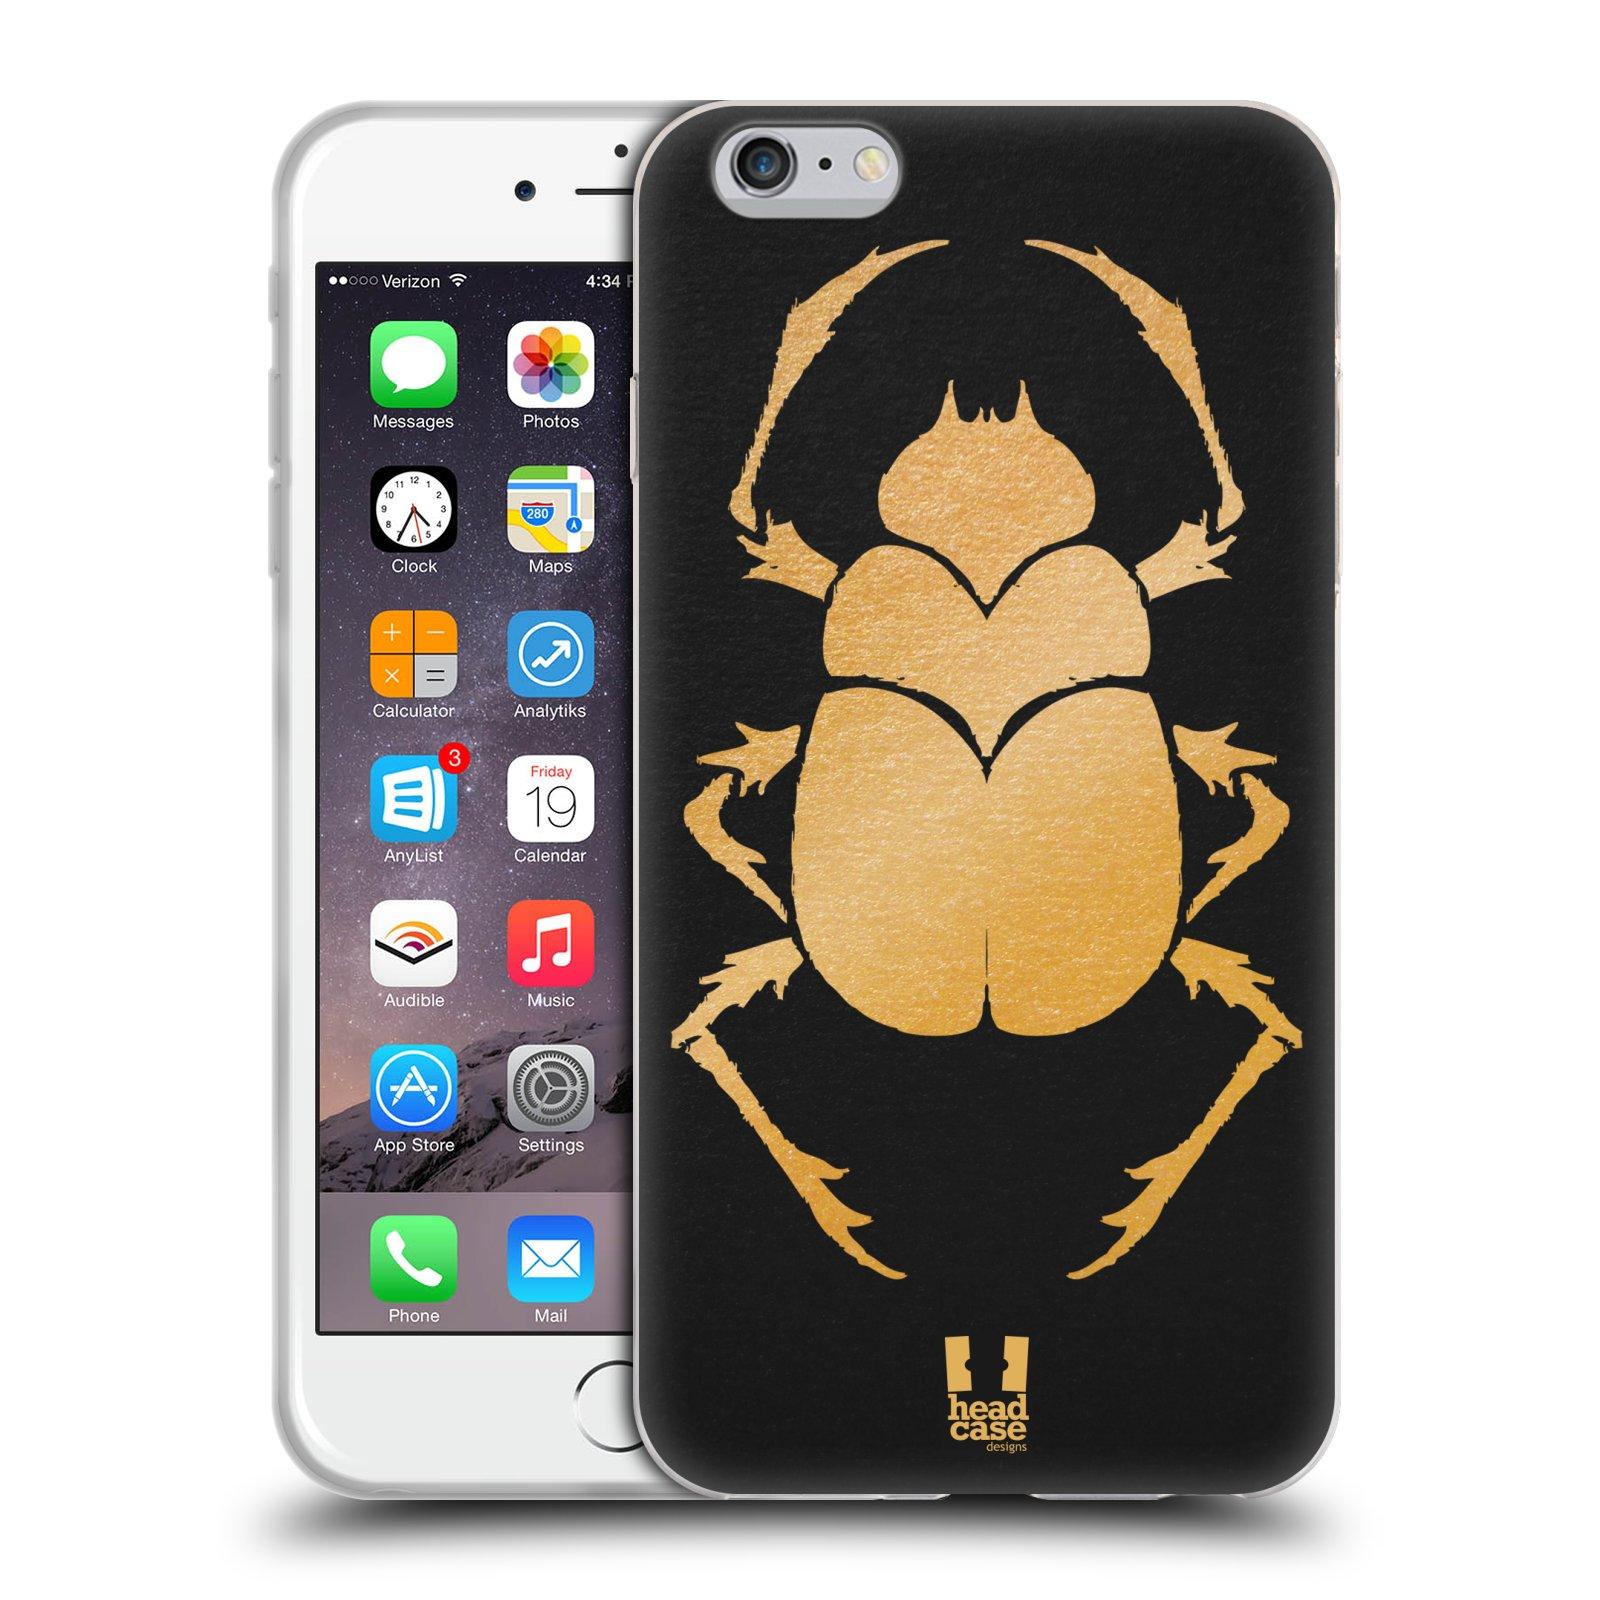 HEAD CASE silikonový obal na mobil Apple Iphone 6 PLUS/ 6S PLUS vzor EGYPT zlatá a černá BROUK SKARAB